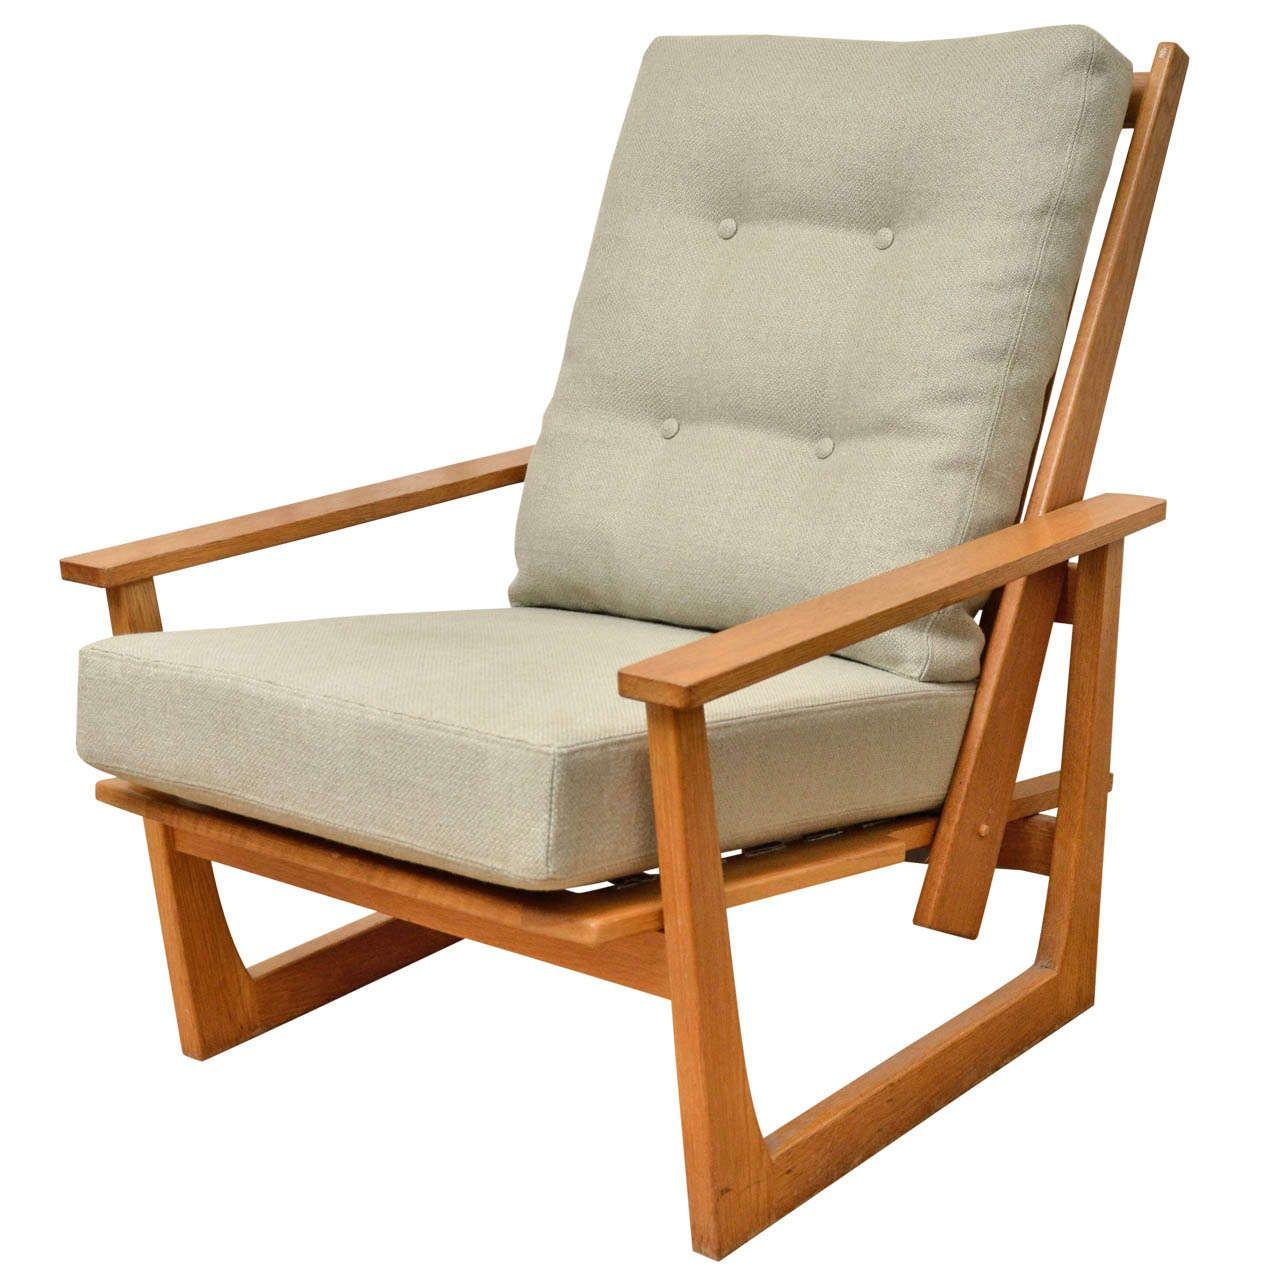 Reclining Wooden Lounge Chair | 1stdibs.com